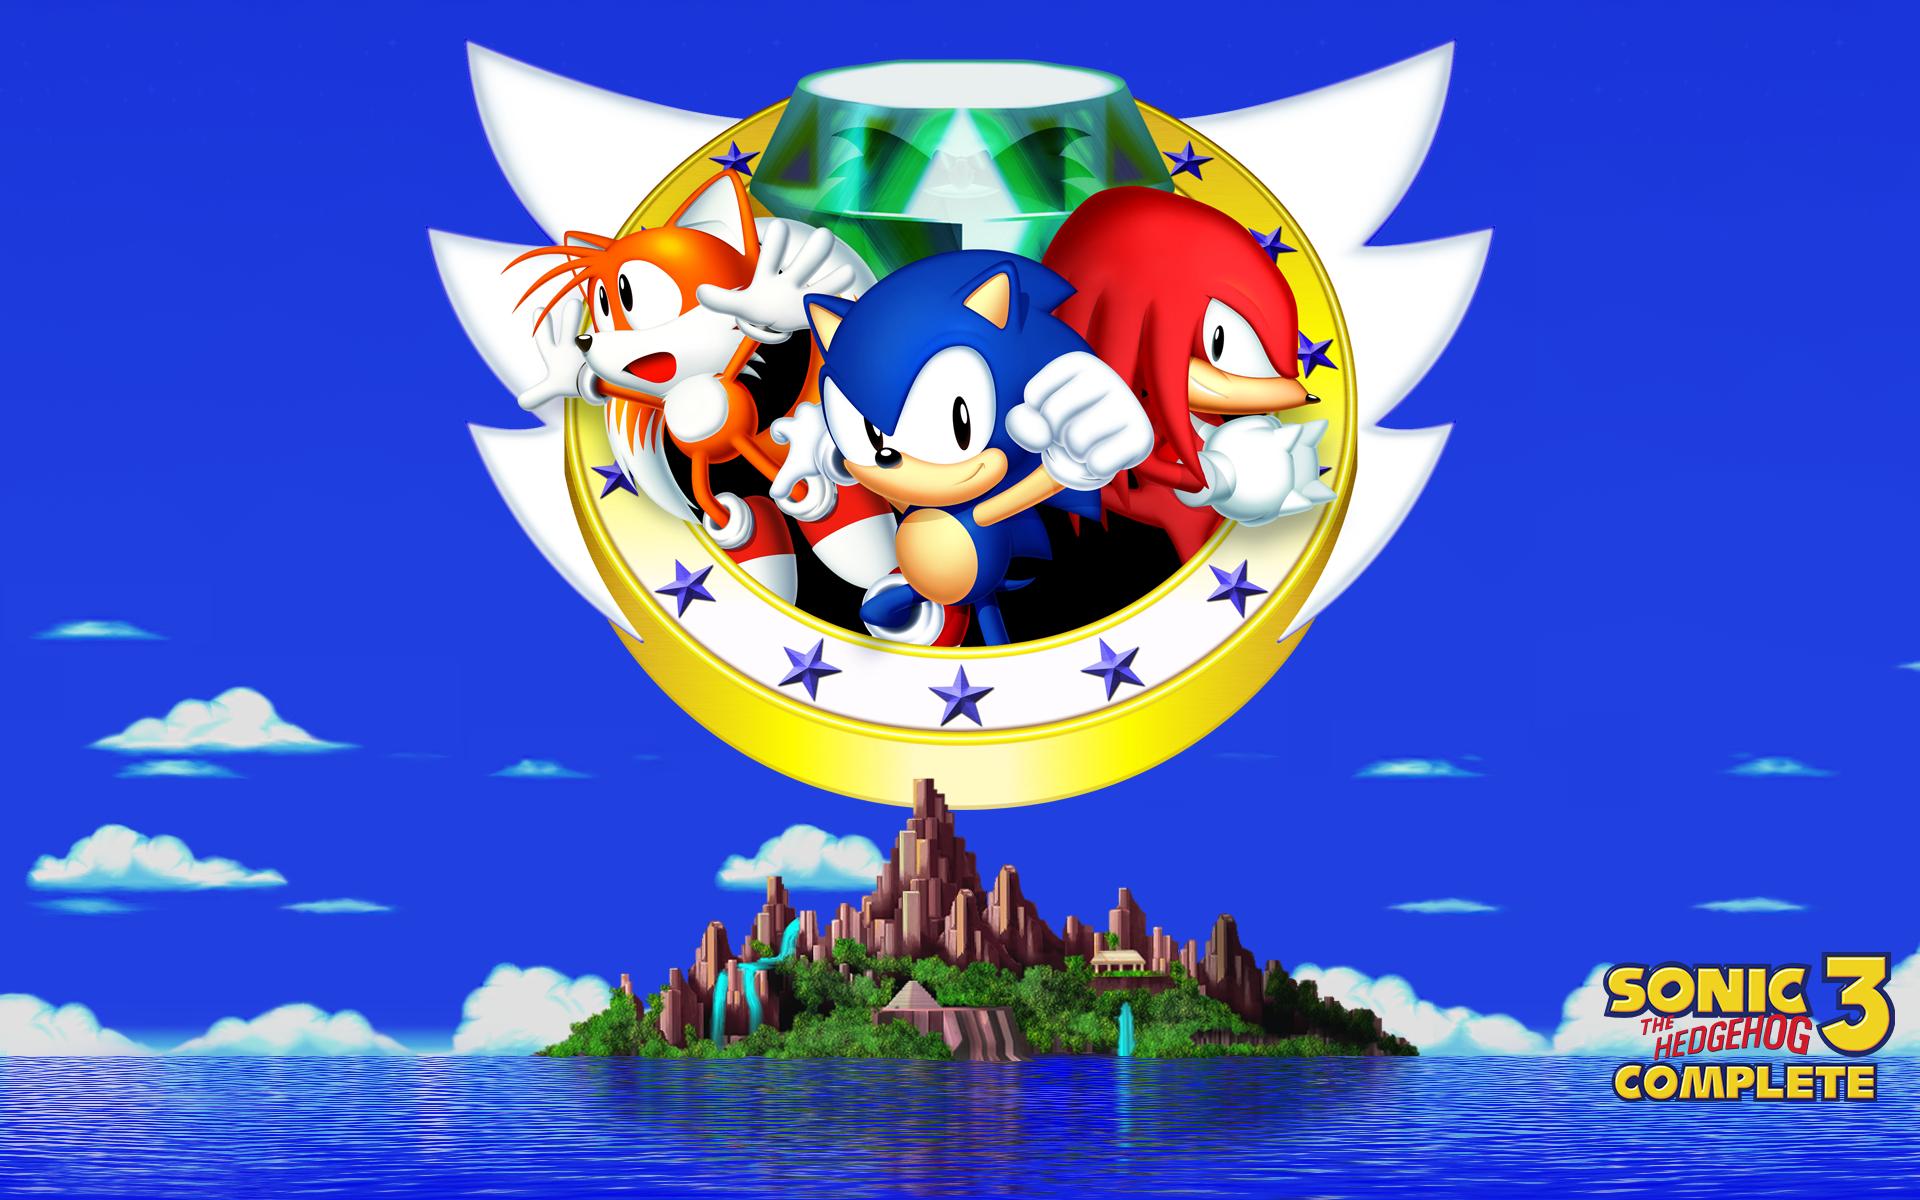 Wallpaper Sonic Tails Character Knuckles 1920x1200 Zhouzj921027 1389609 Hd Wallpapers Wallhere